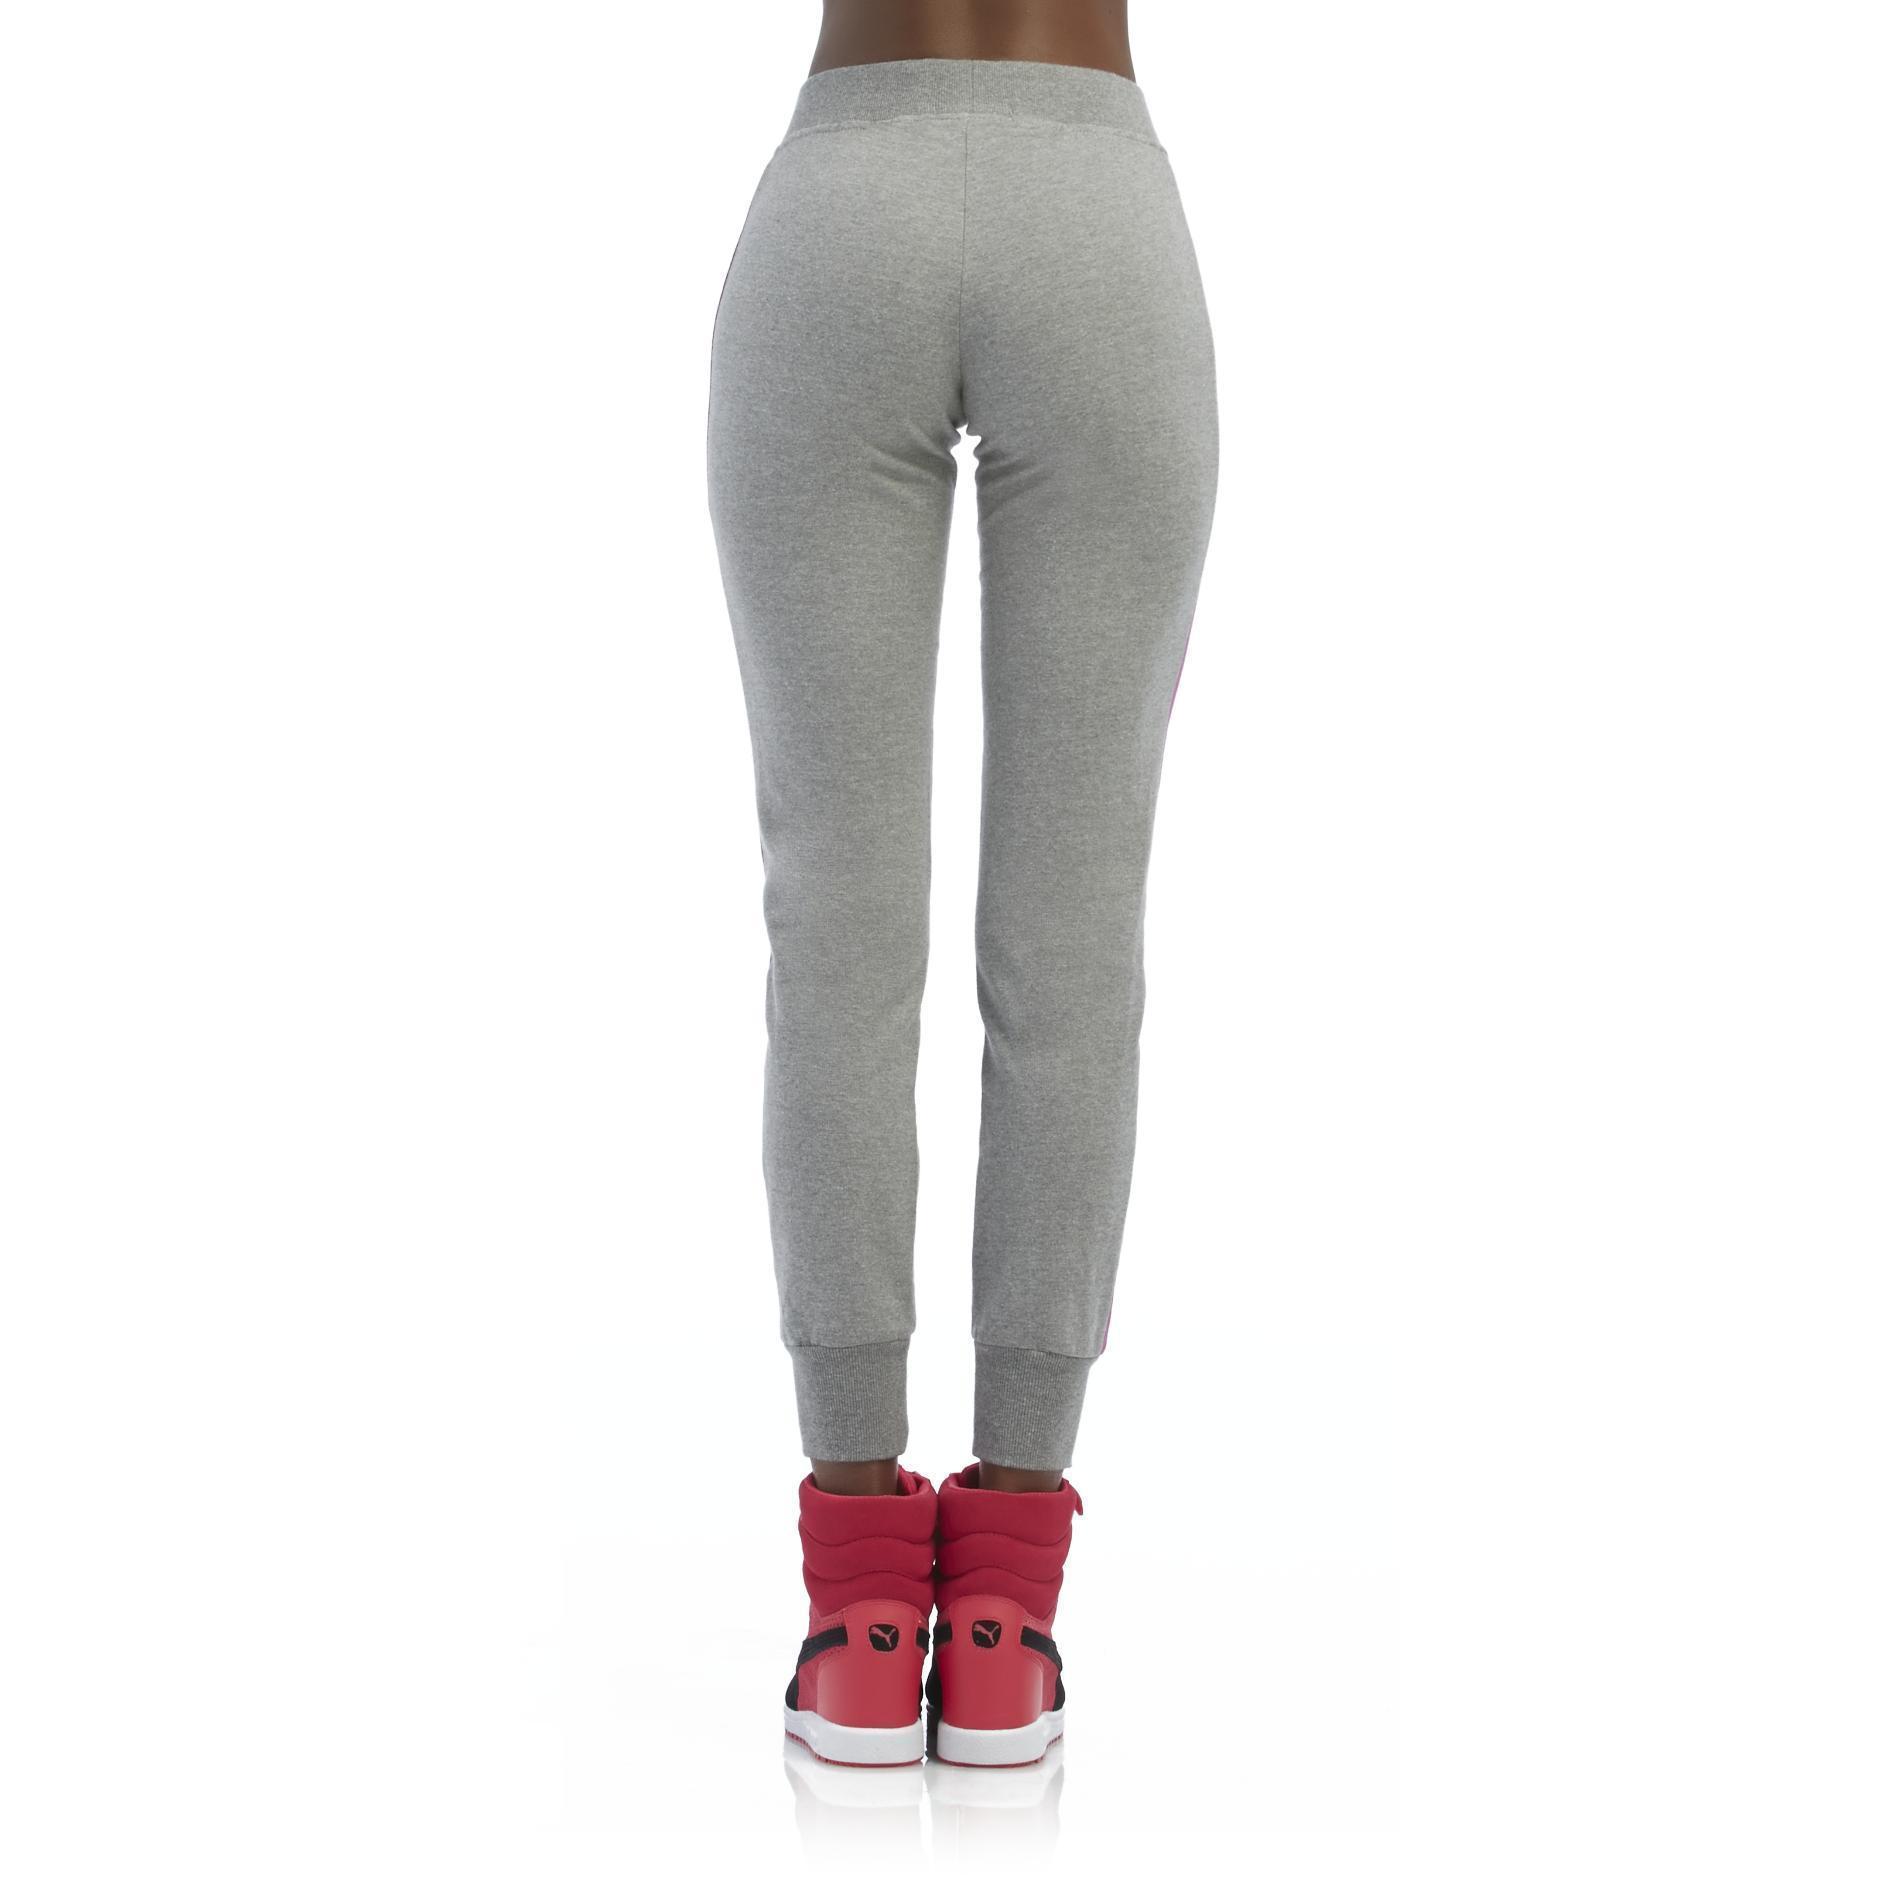 Nicki Minaj Women's Colorblock Sweatpants